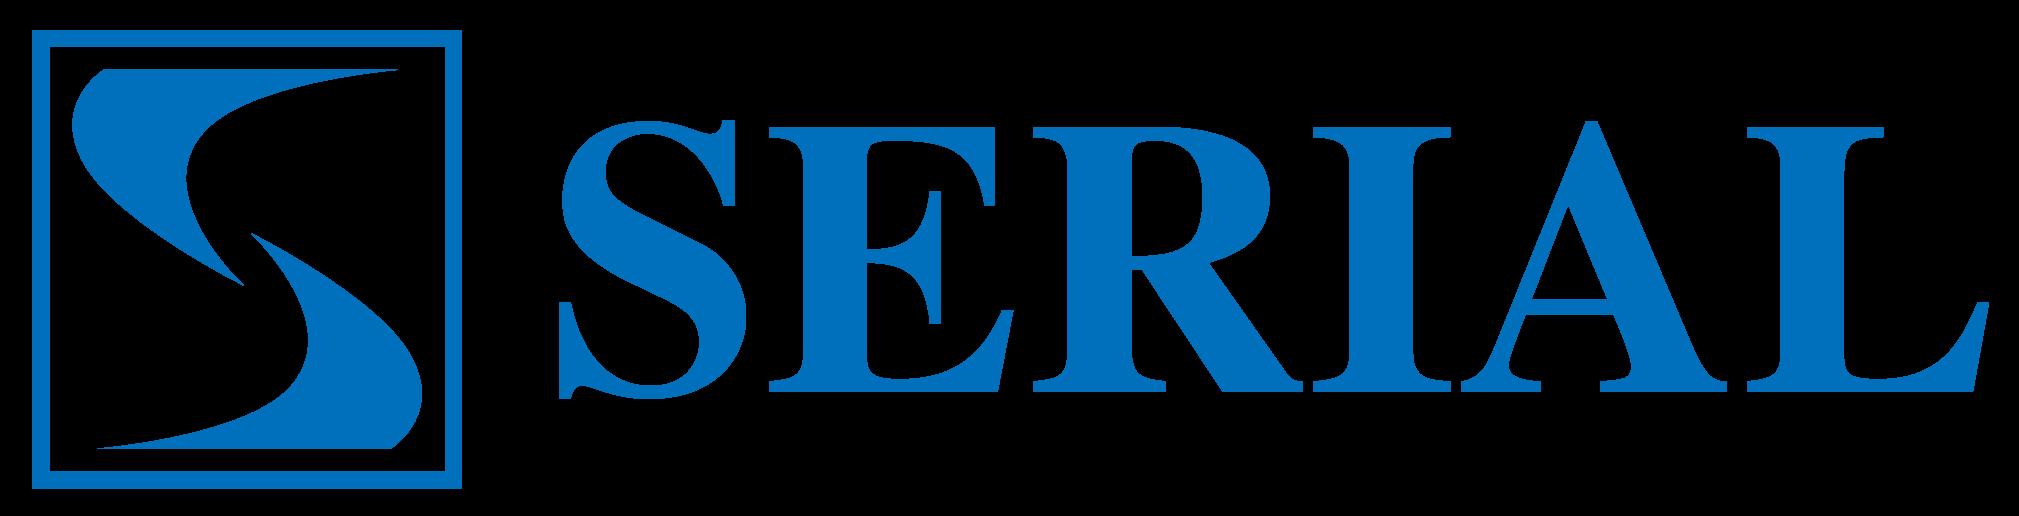 serial-logo